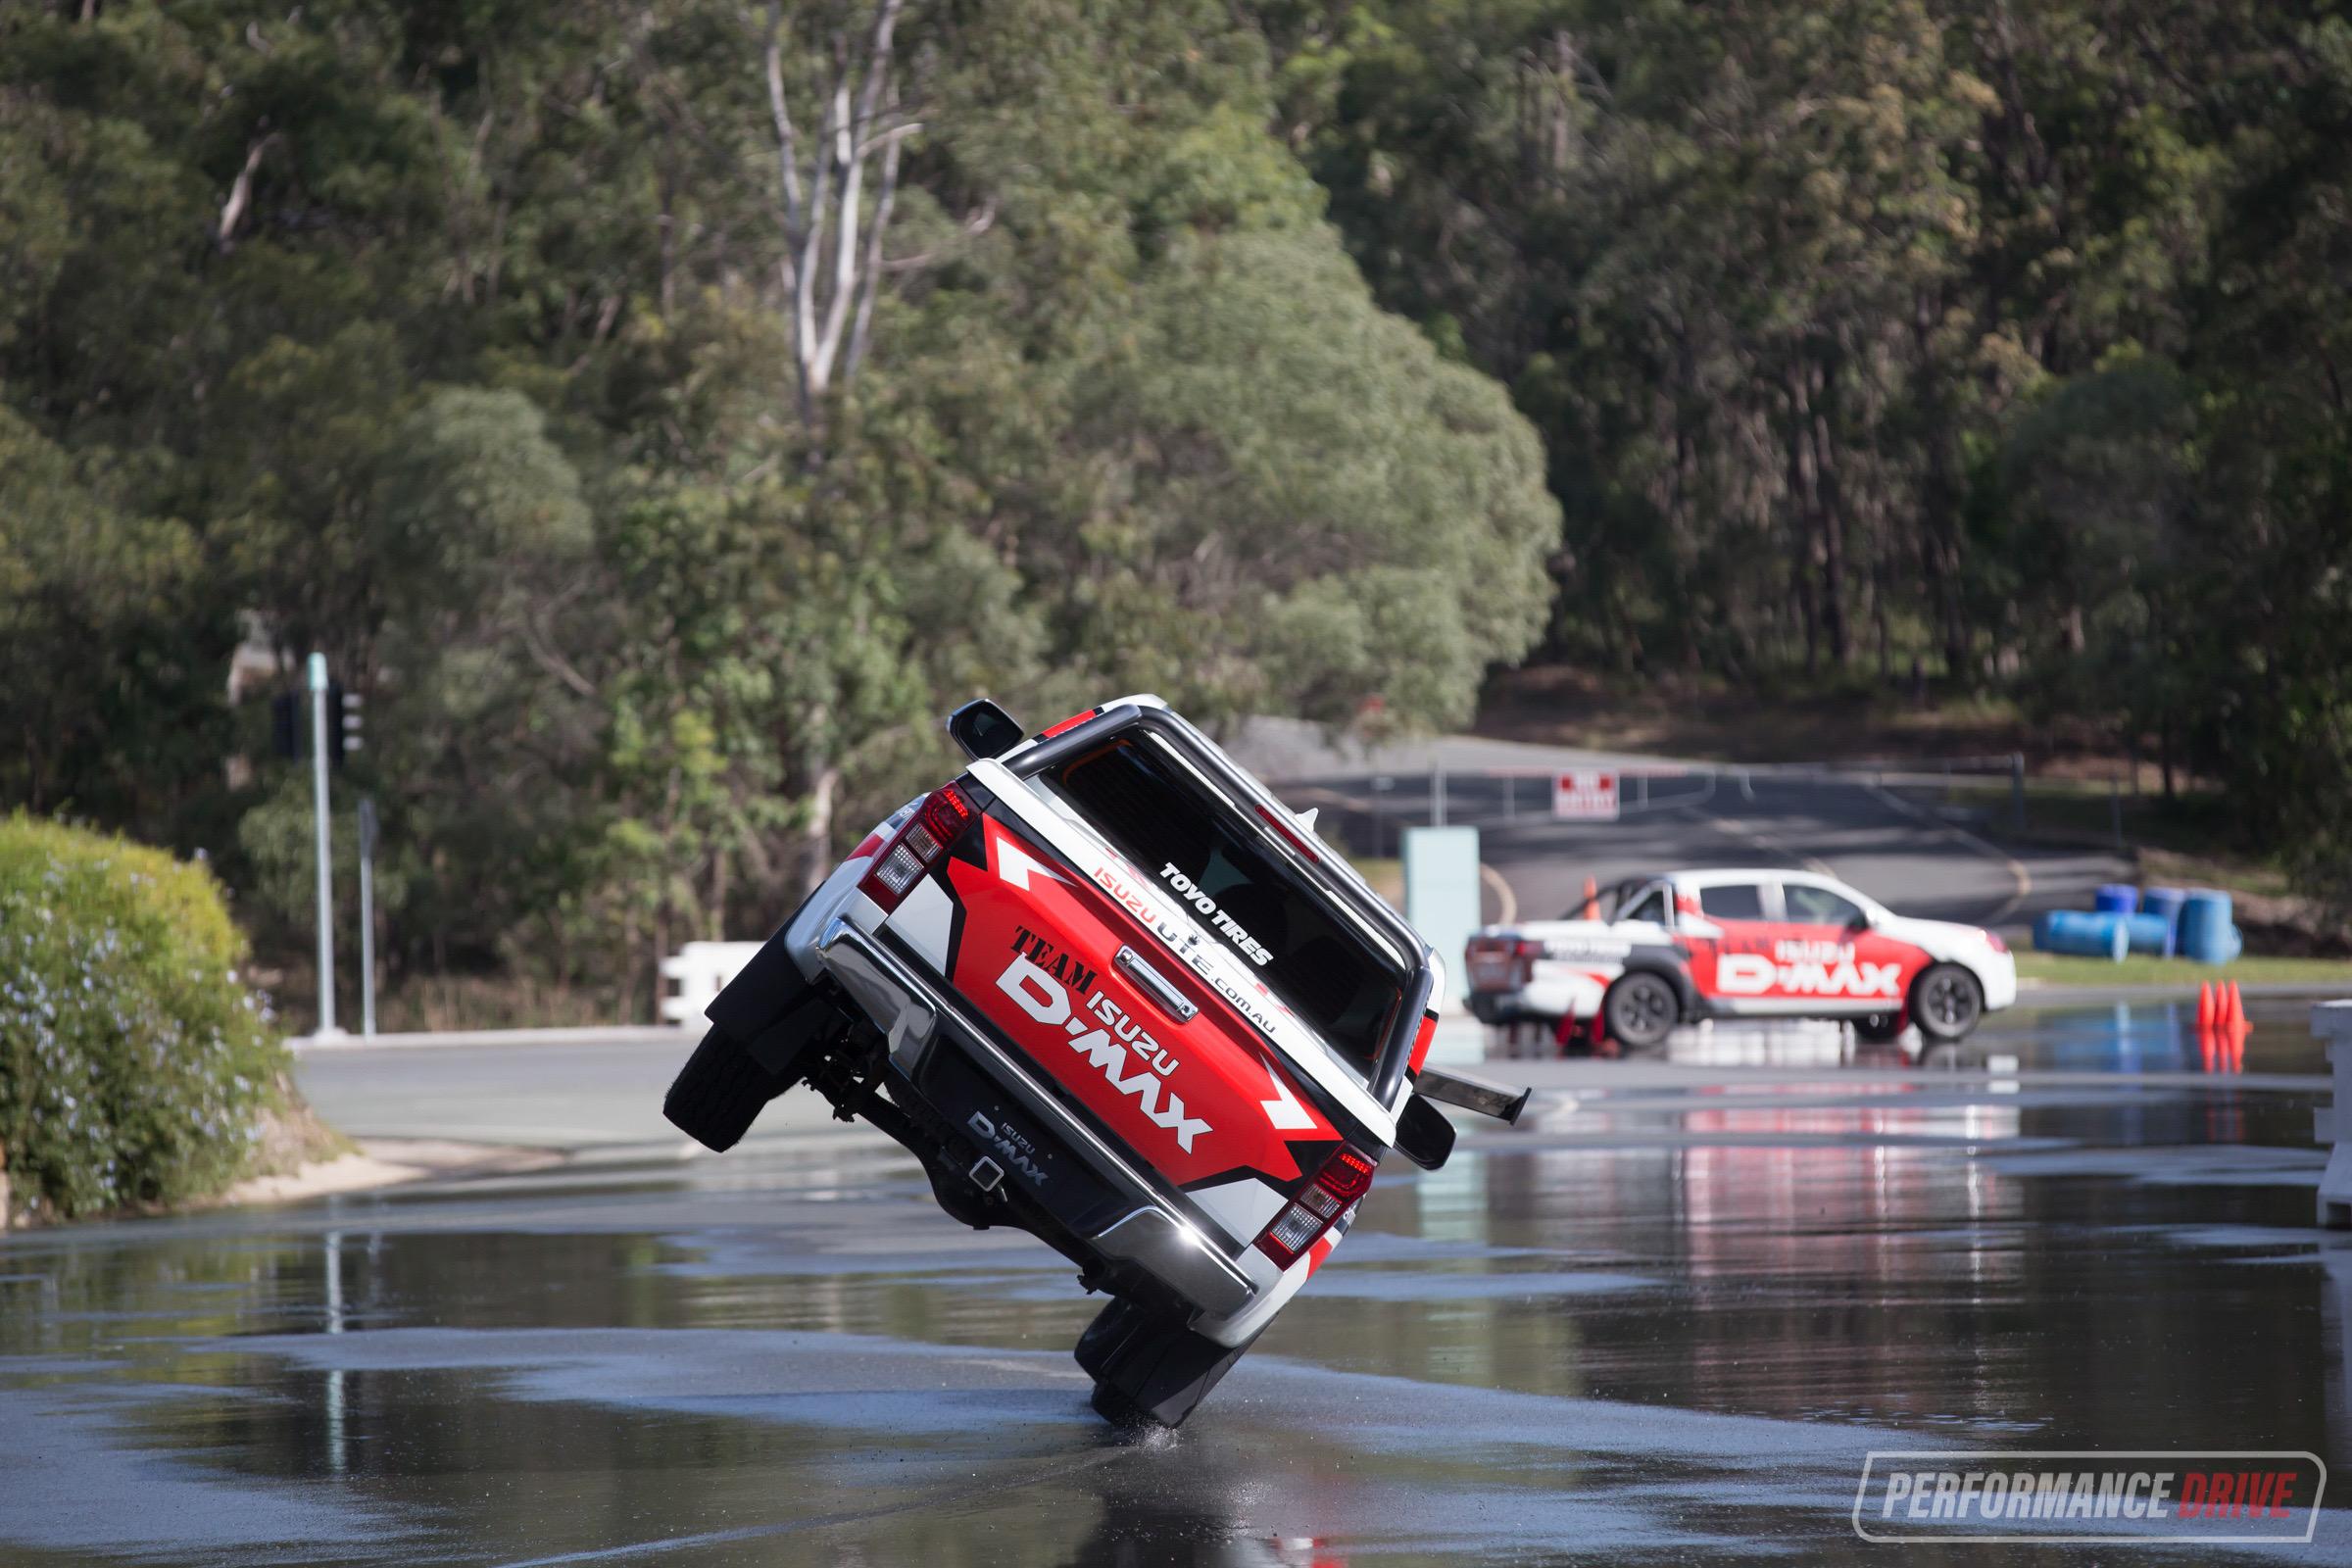 2018 isuzu d-max & mu-x review – australian launch   performancedrive